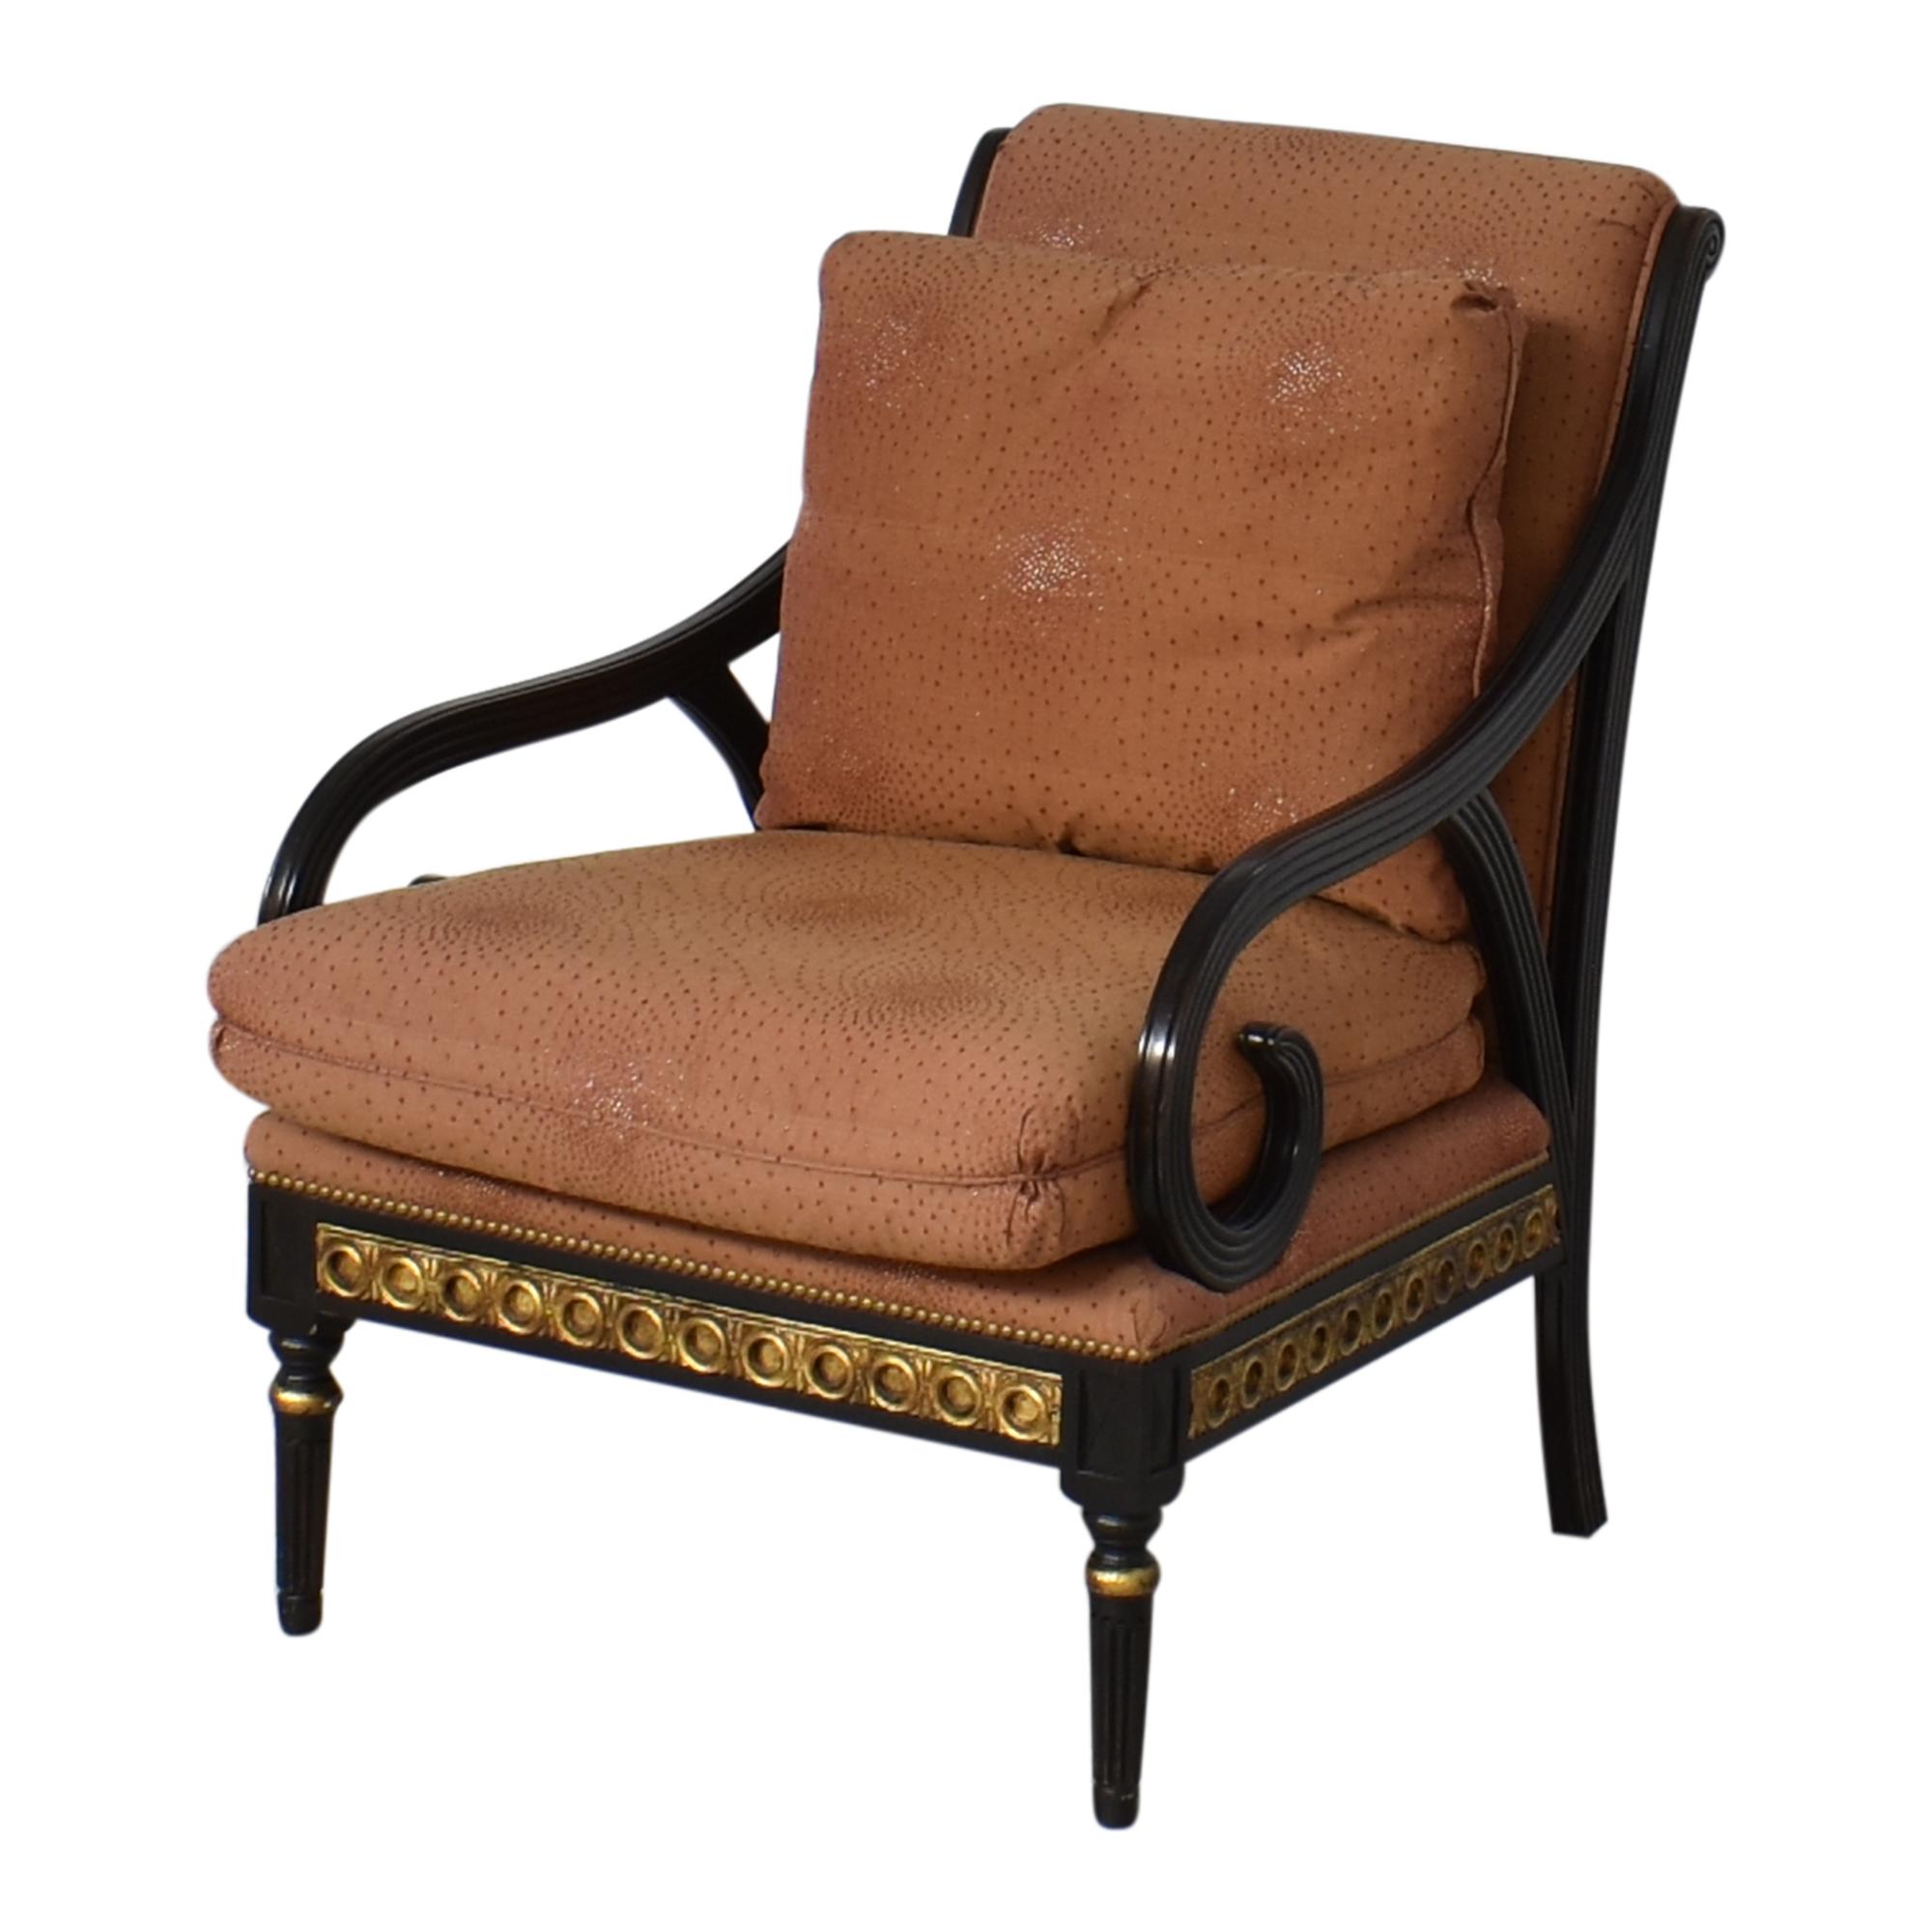 IMI Furniture IMI Furniture Scroll Arm Accent Chair on sale